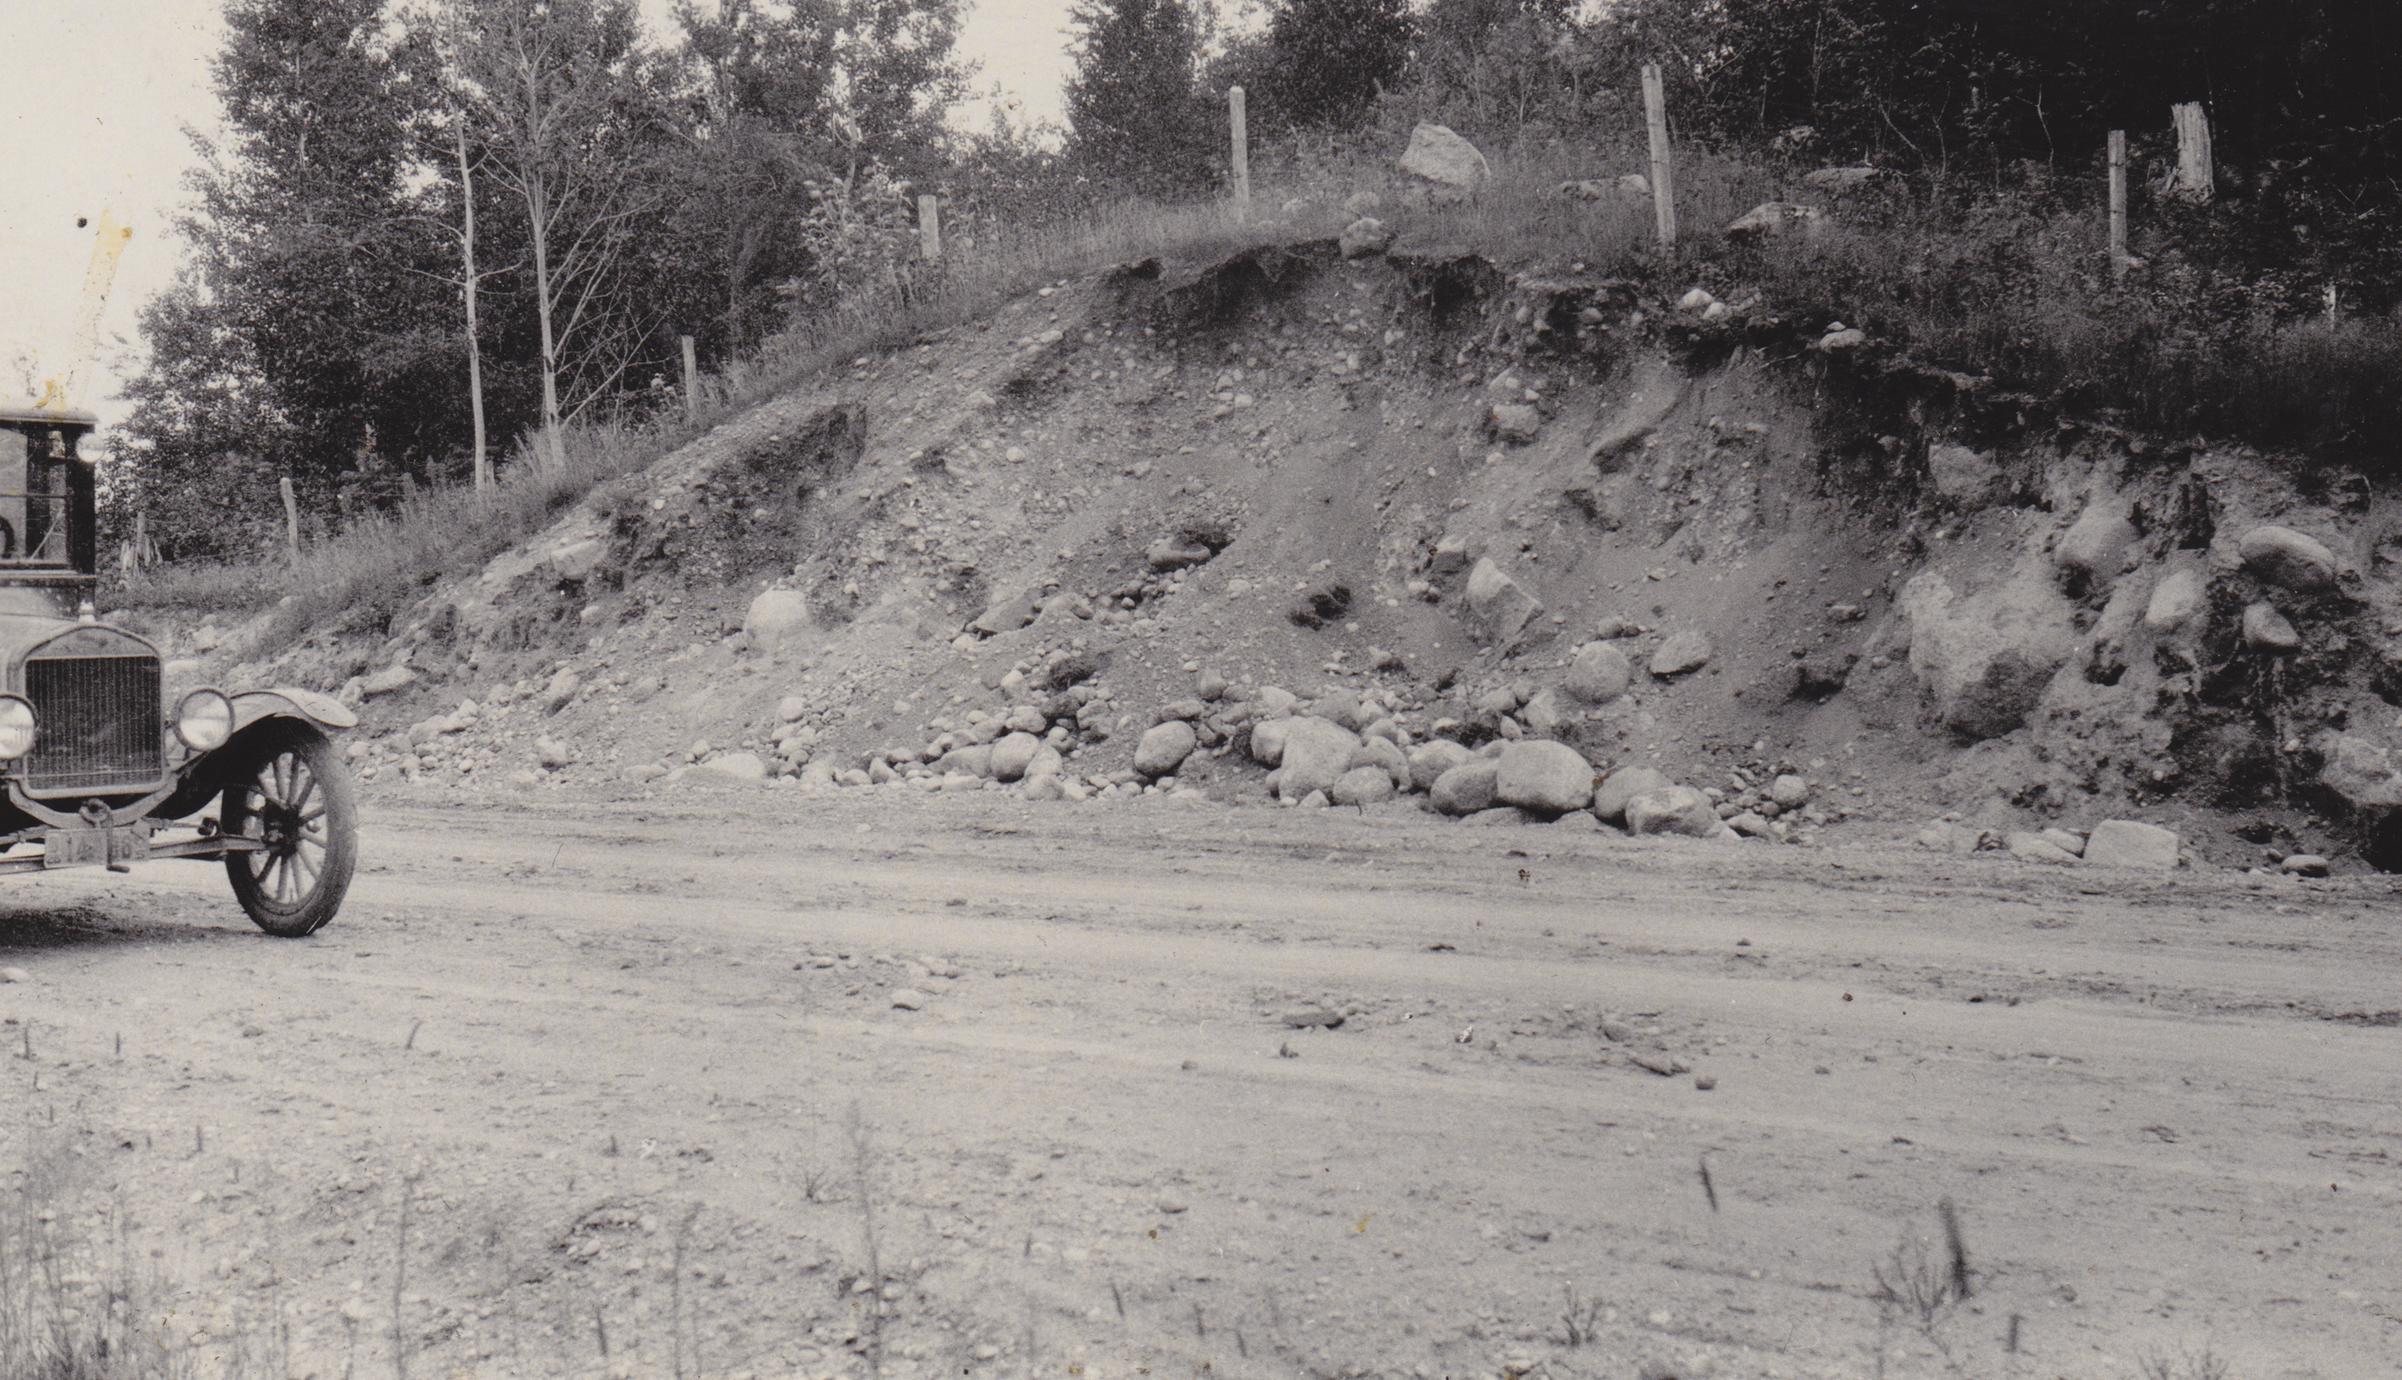 Road cut in moraine near Galloway, WI